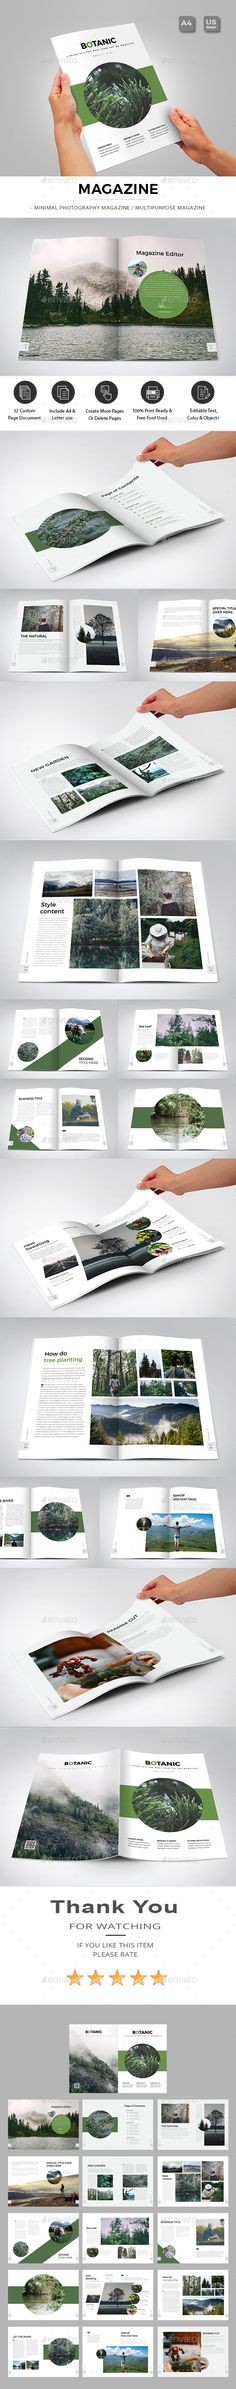 Magazine - Magazines Print Templates Download here : https://graphicriver.net/item/magazine/19538098?s_rank=16&ref=Al-fatih